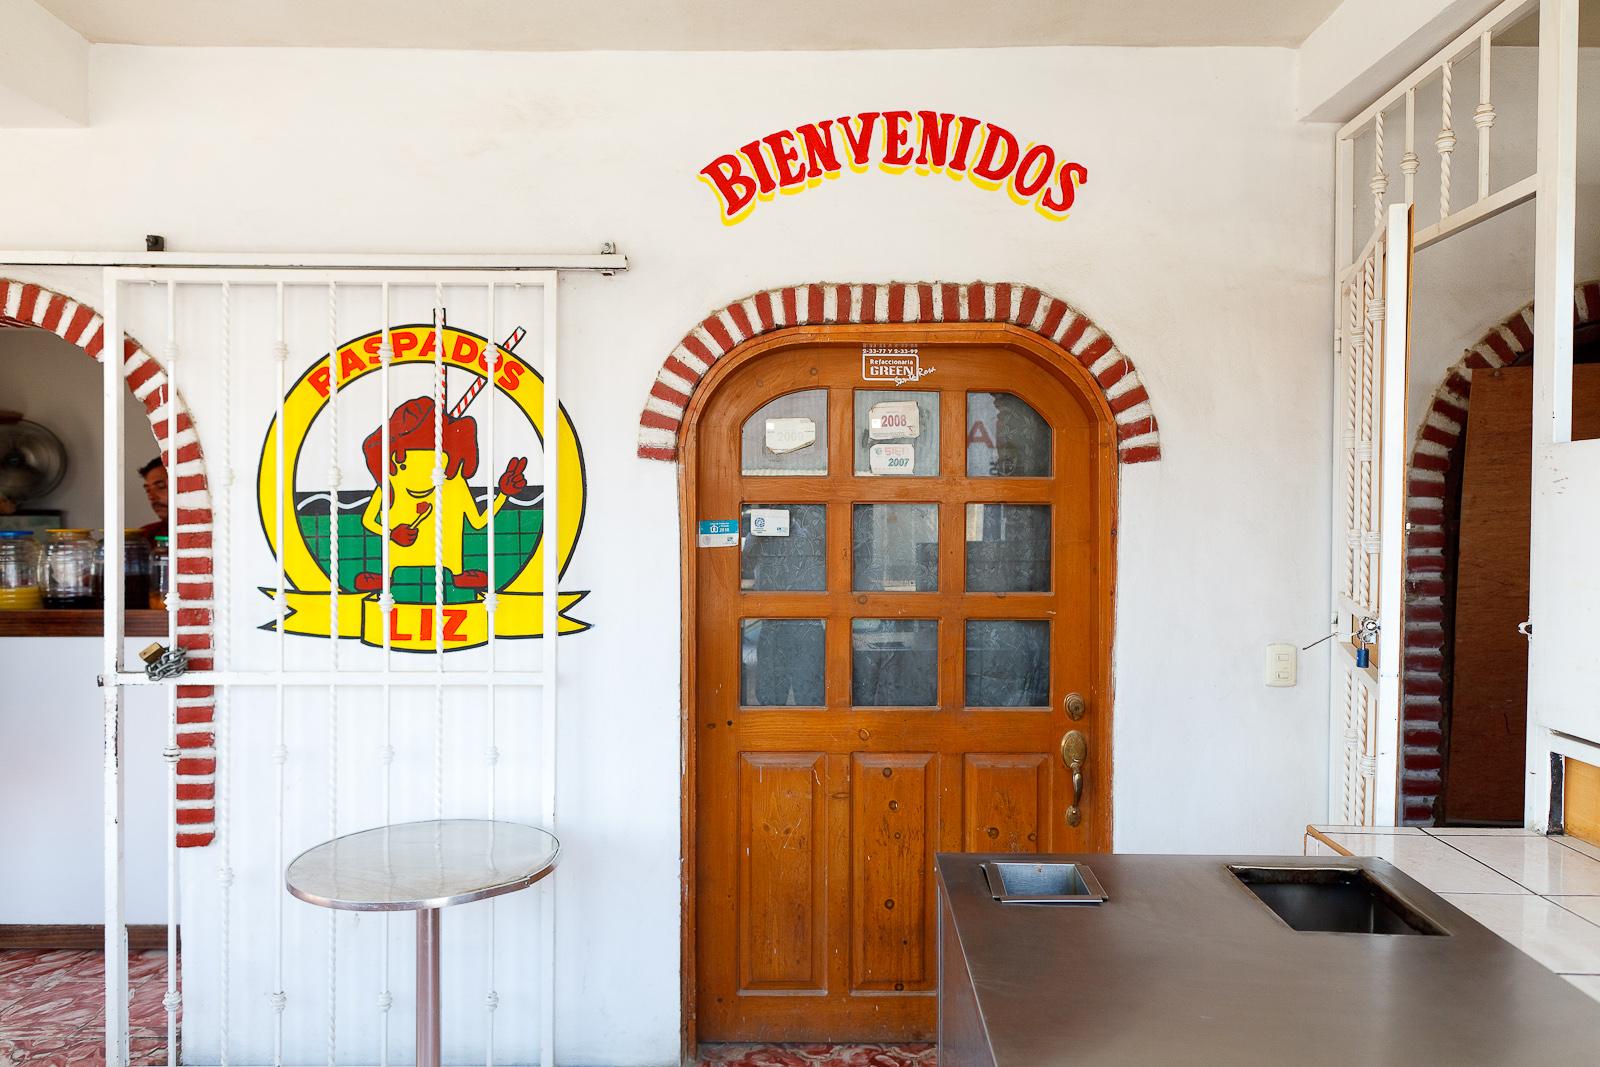 Entrance to Raspados Liz